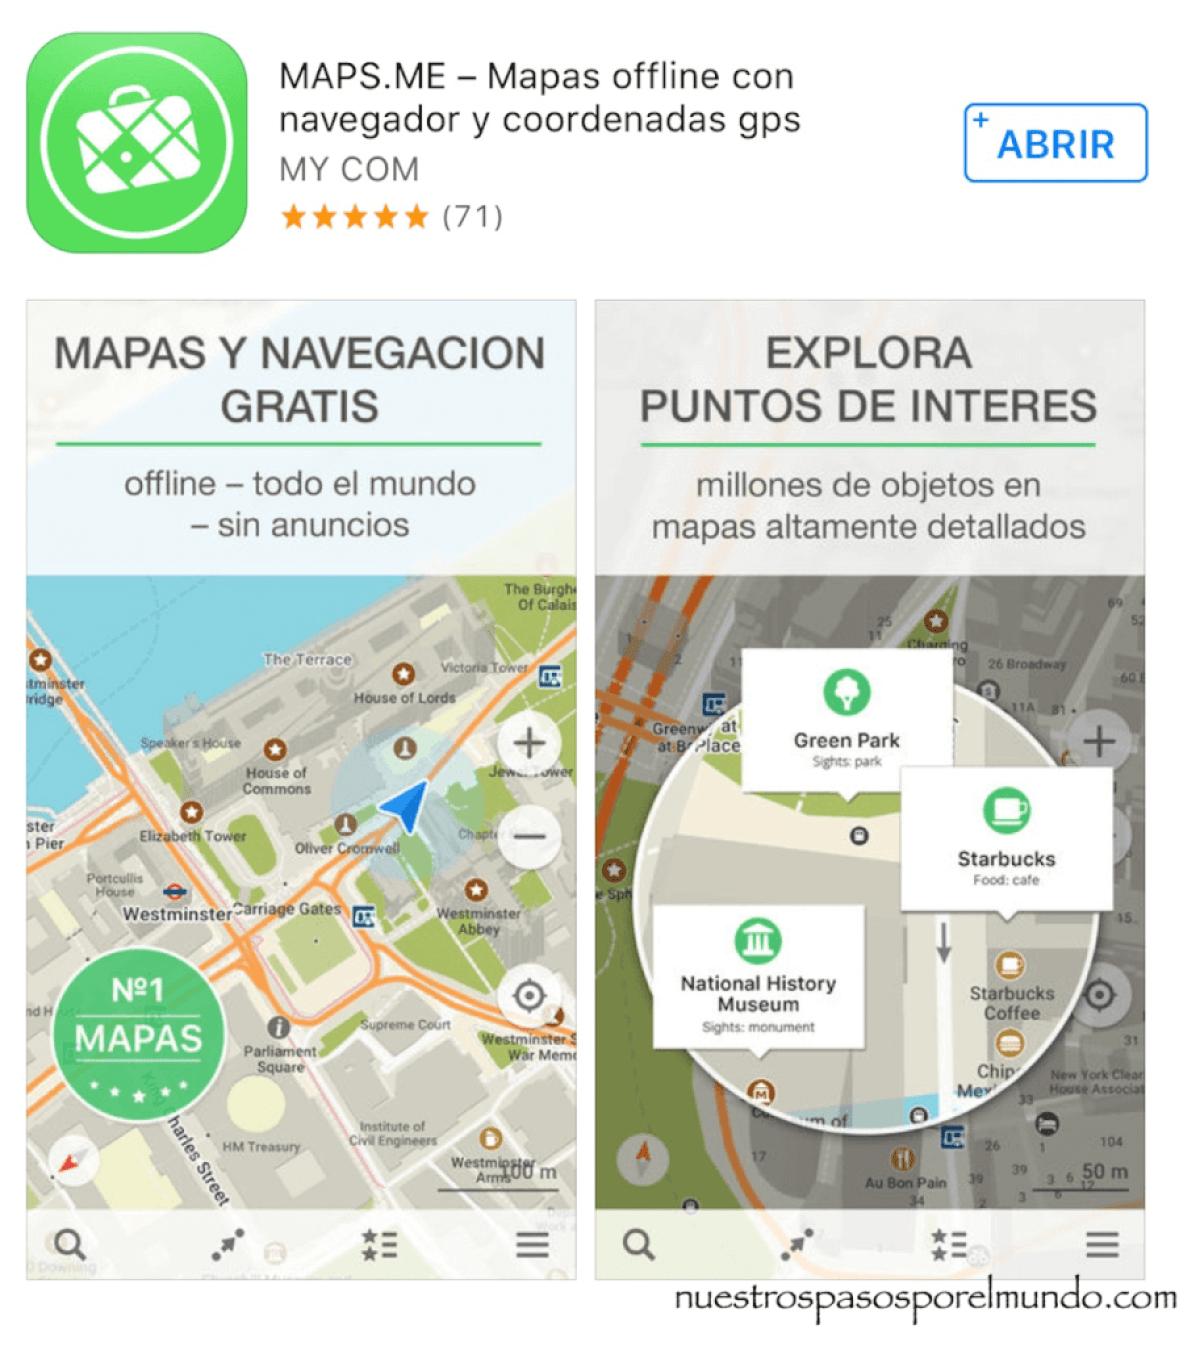 maps_me